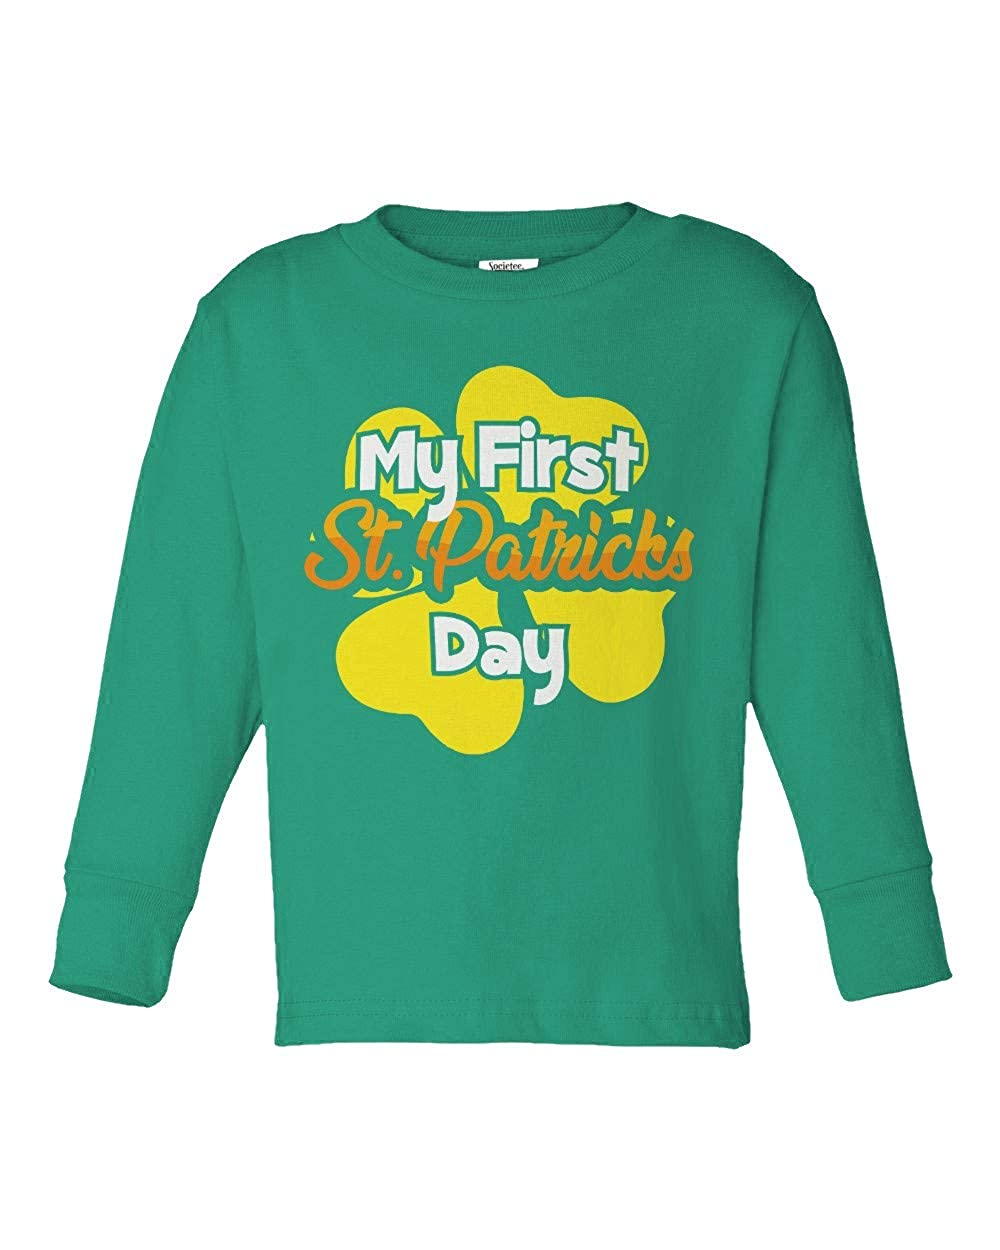 Societee My First St Patricks Day Girls Boys Toddler Long Sleeve T-Shirt